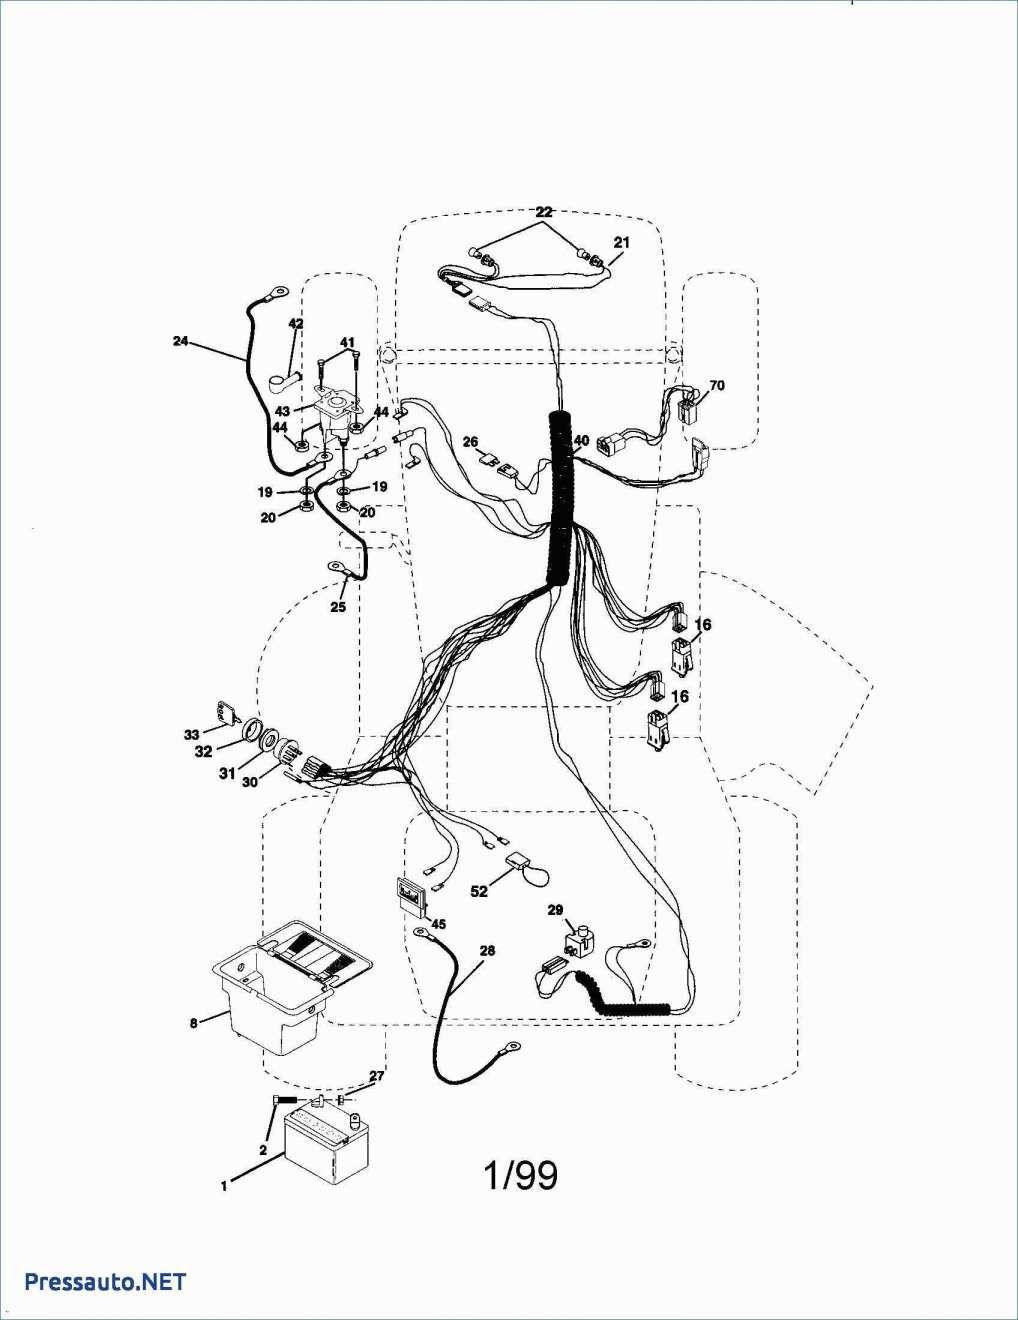 15 Wiring Diagram For Lawn Mower Kohler Engine Engine Diagram Wiringg Net Mower Lawn Mower Diagram